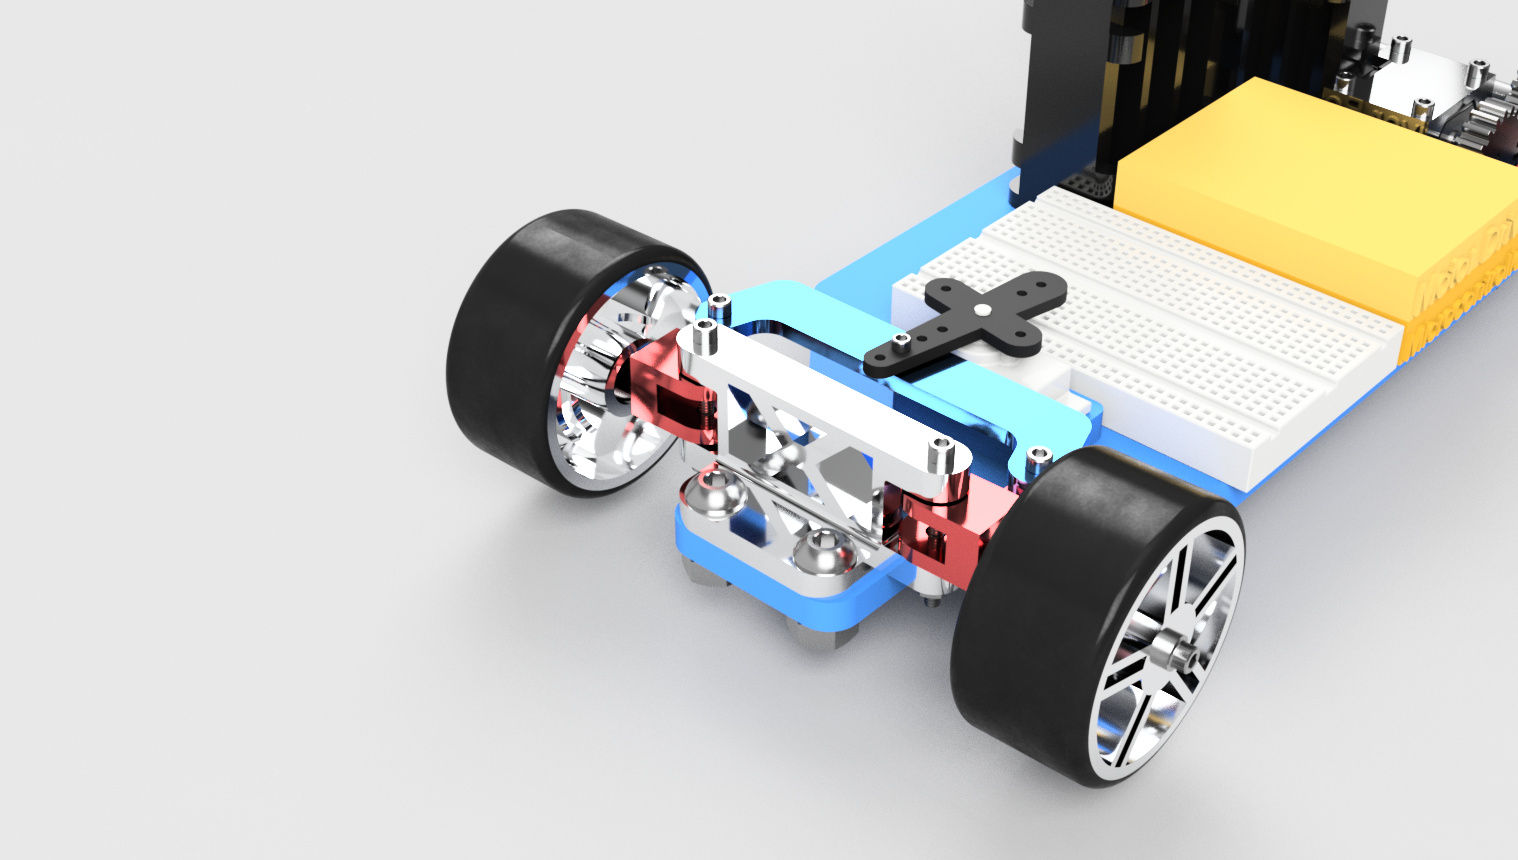 3d Printed Remote Control Rc Car Autodesk Online Gallery Stepper Raasrendering 5aebb52d A2c8 4c5f Ba47 9c6b6556c7c8 3500